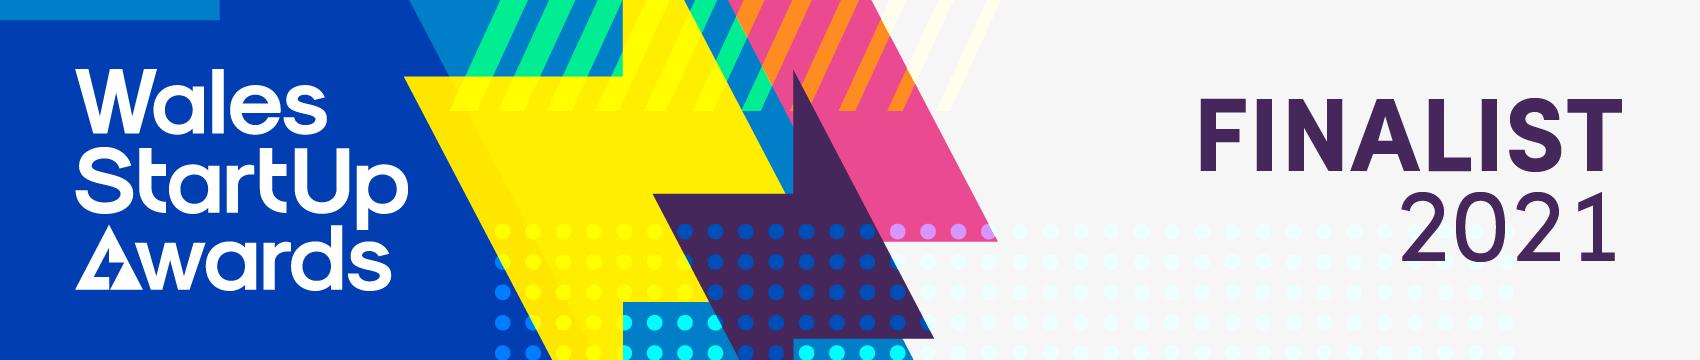 Wales Startup Awards 2021 Finalist MedTech Image